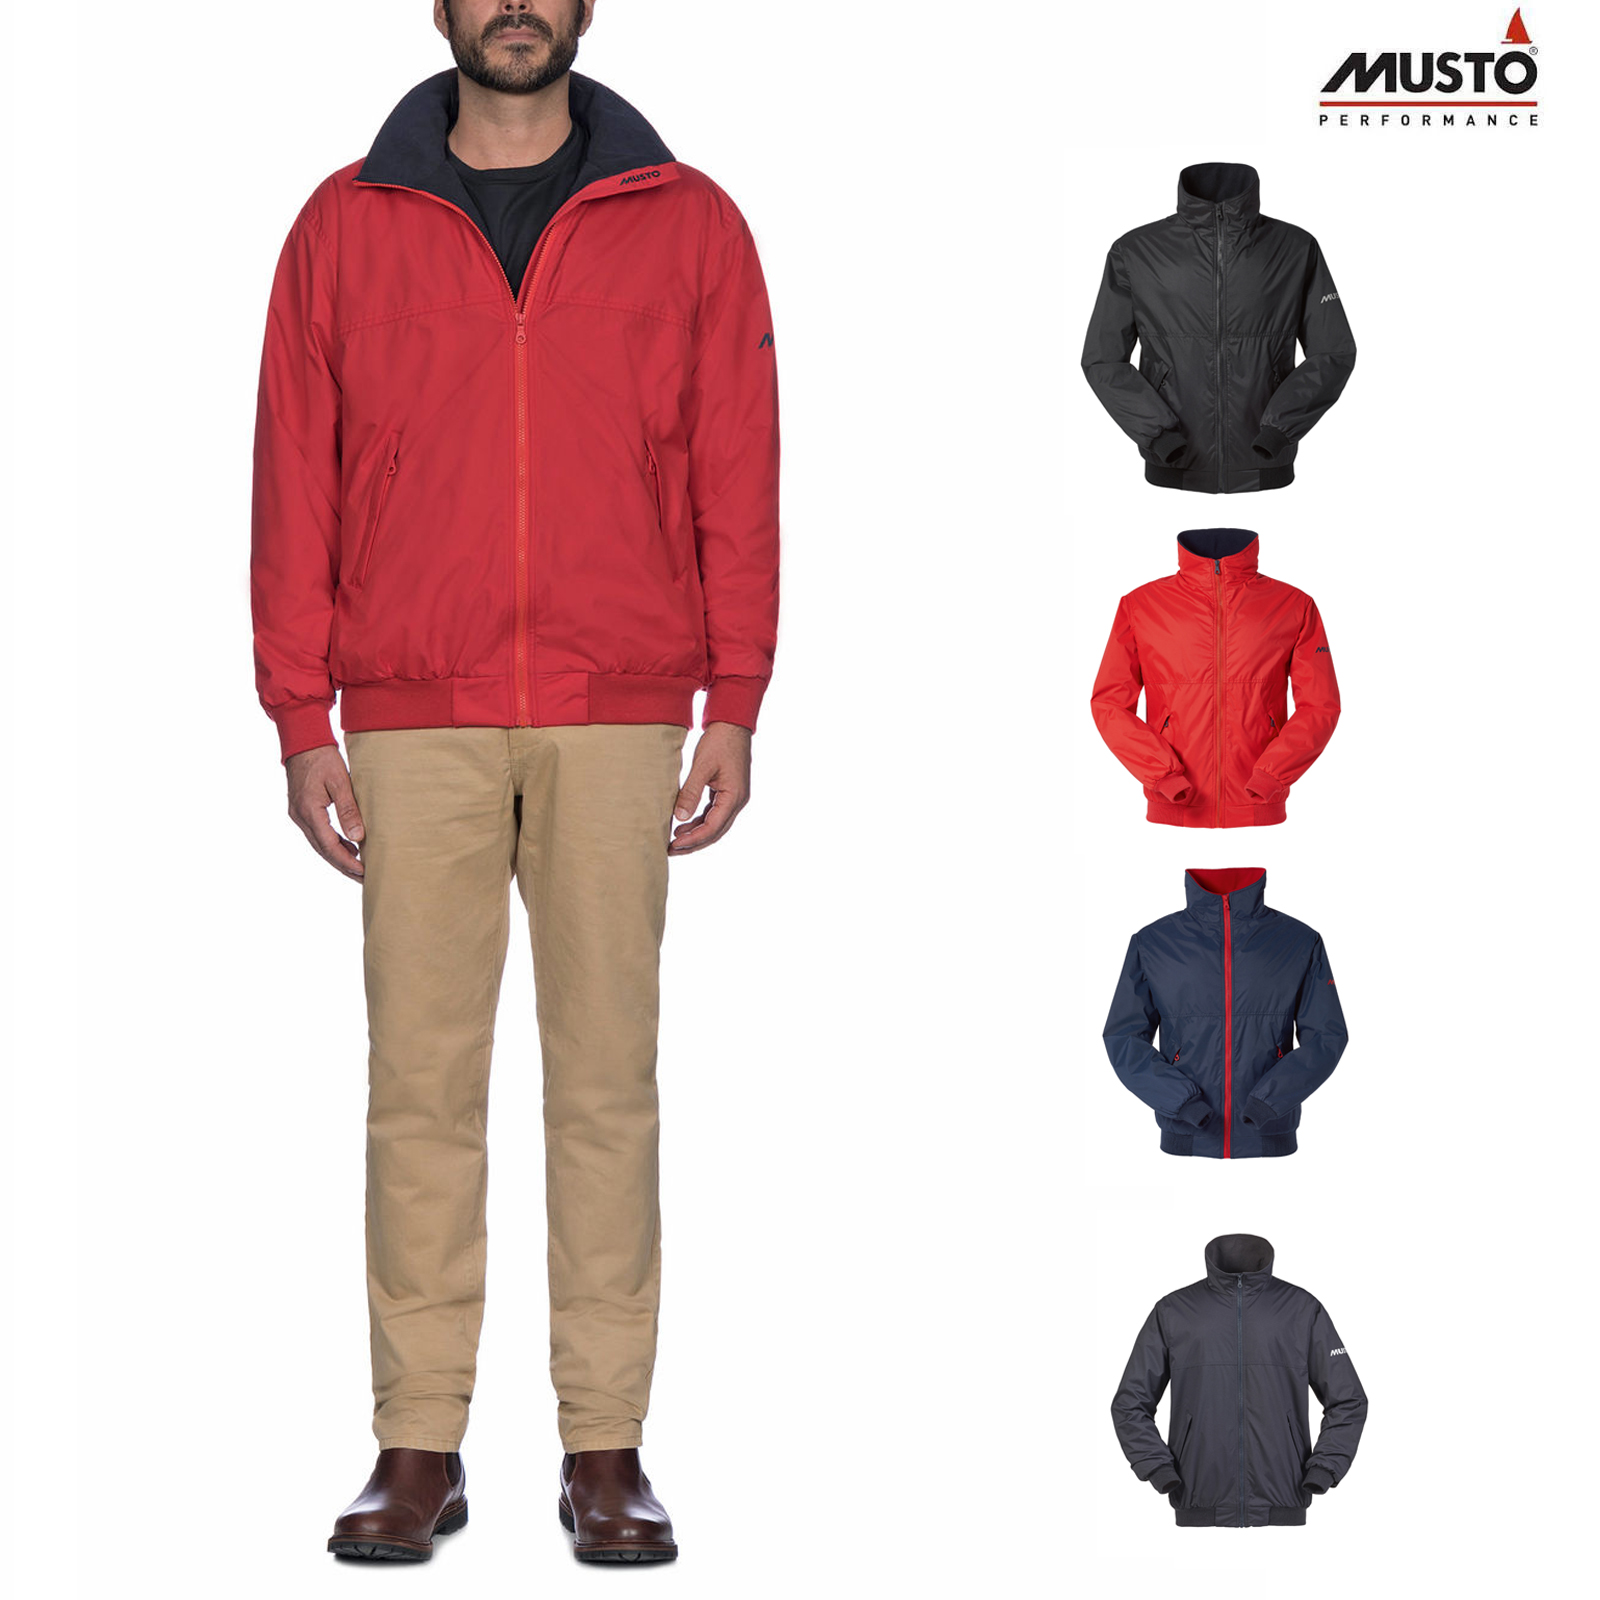 Musto Snug Breathable Blouson II MJ11009